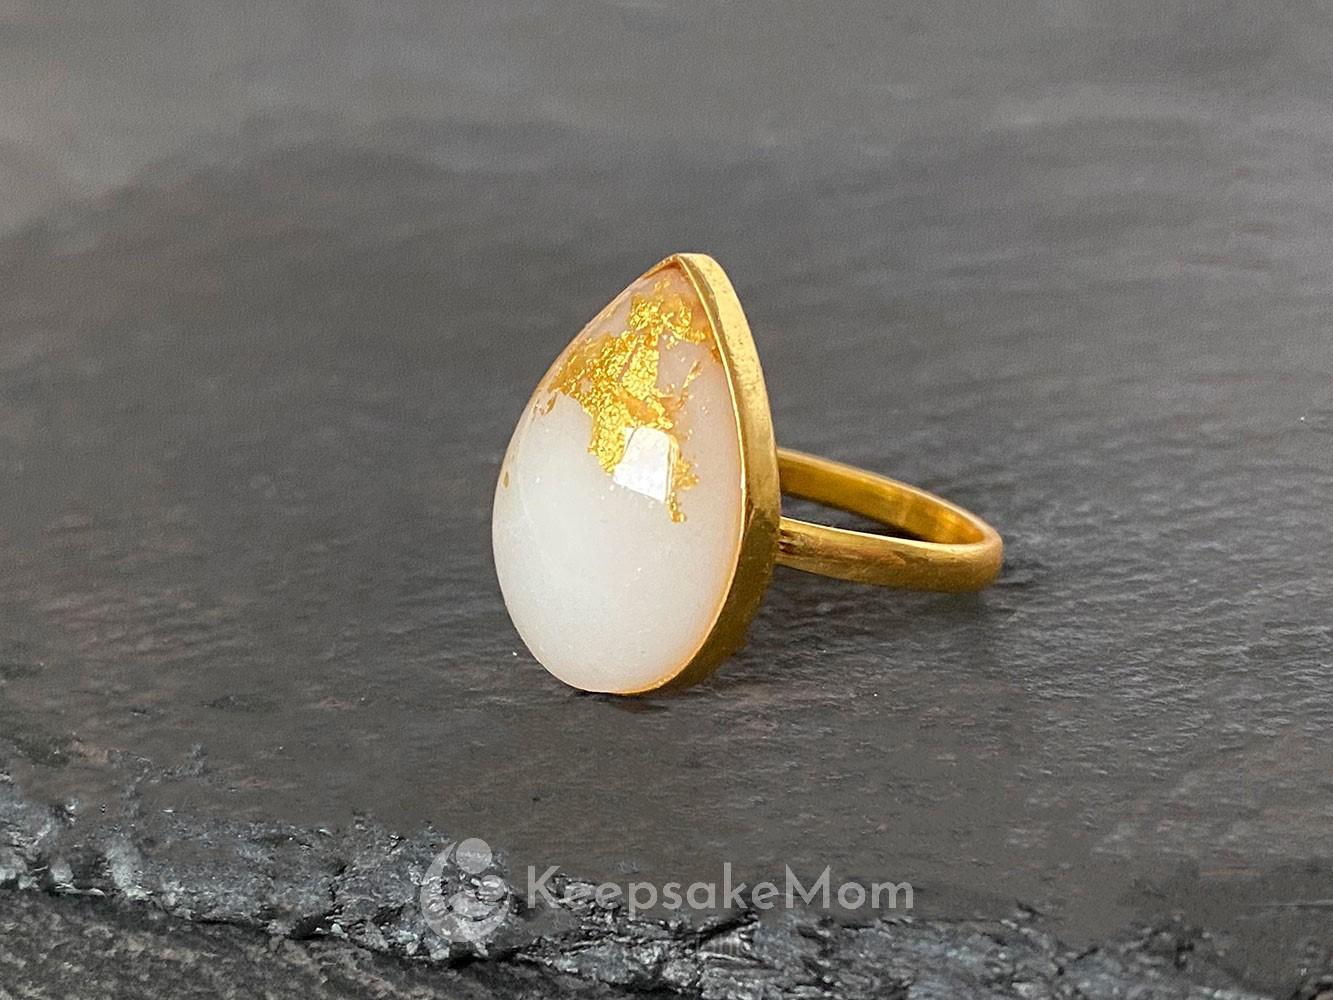 KeepsakeMom Breastmilk Jewelry Breastmilk Ring, The Original Ring, Yellow Gold, Gold Flakes